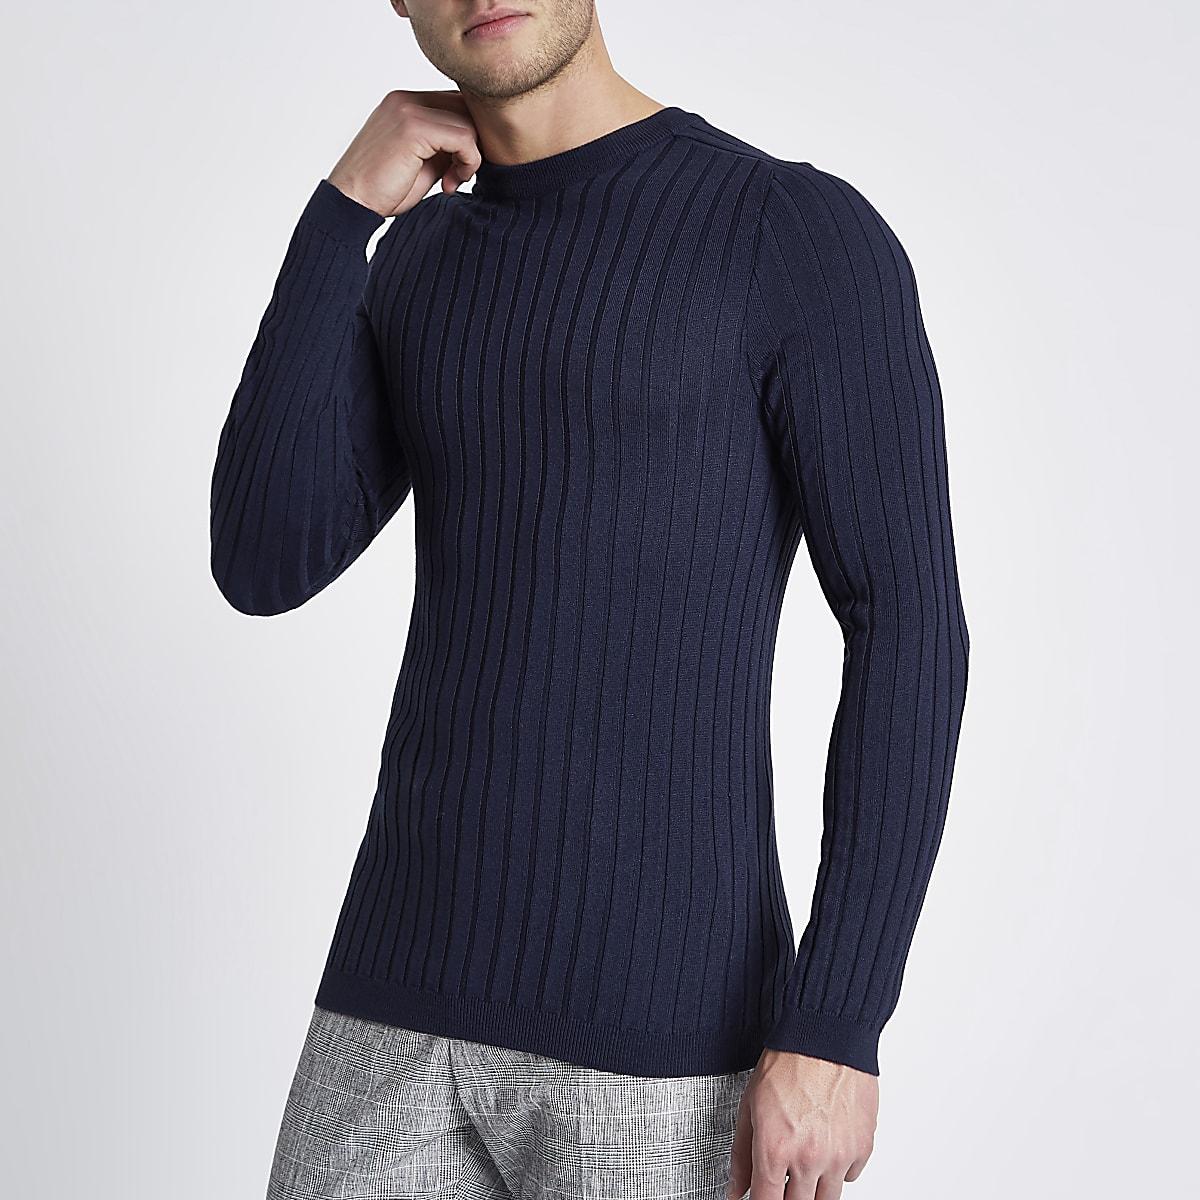 Blue rib knit muscle fit crew neck jumper